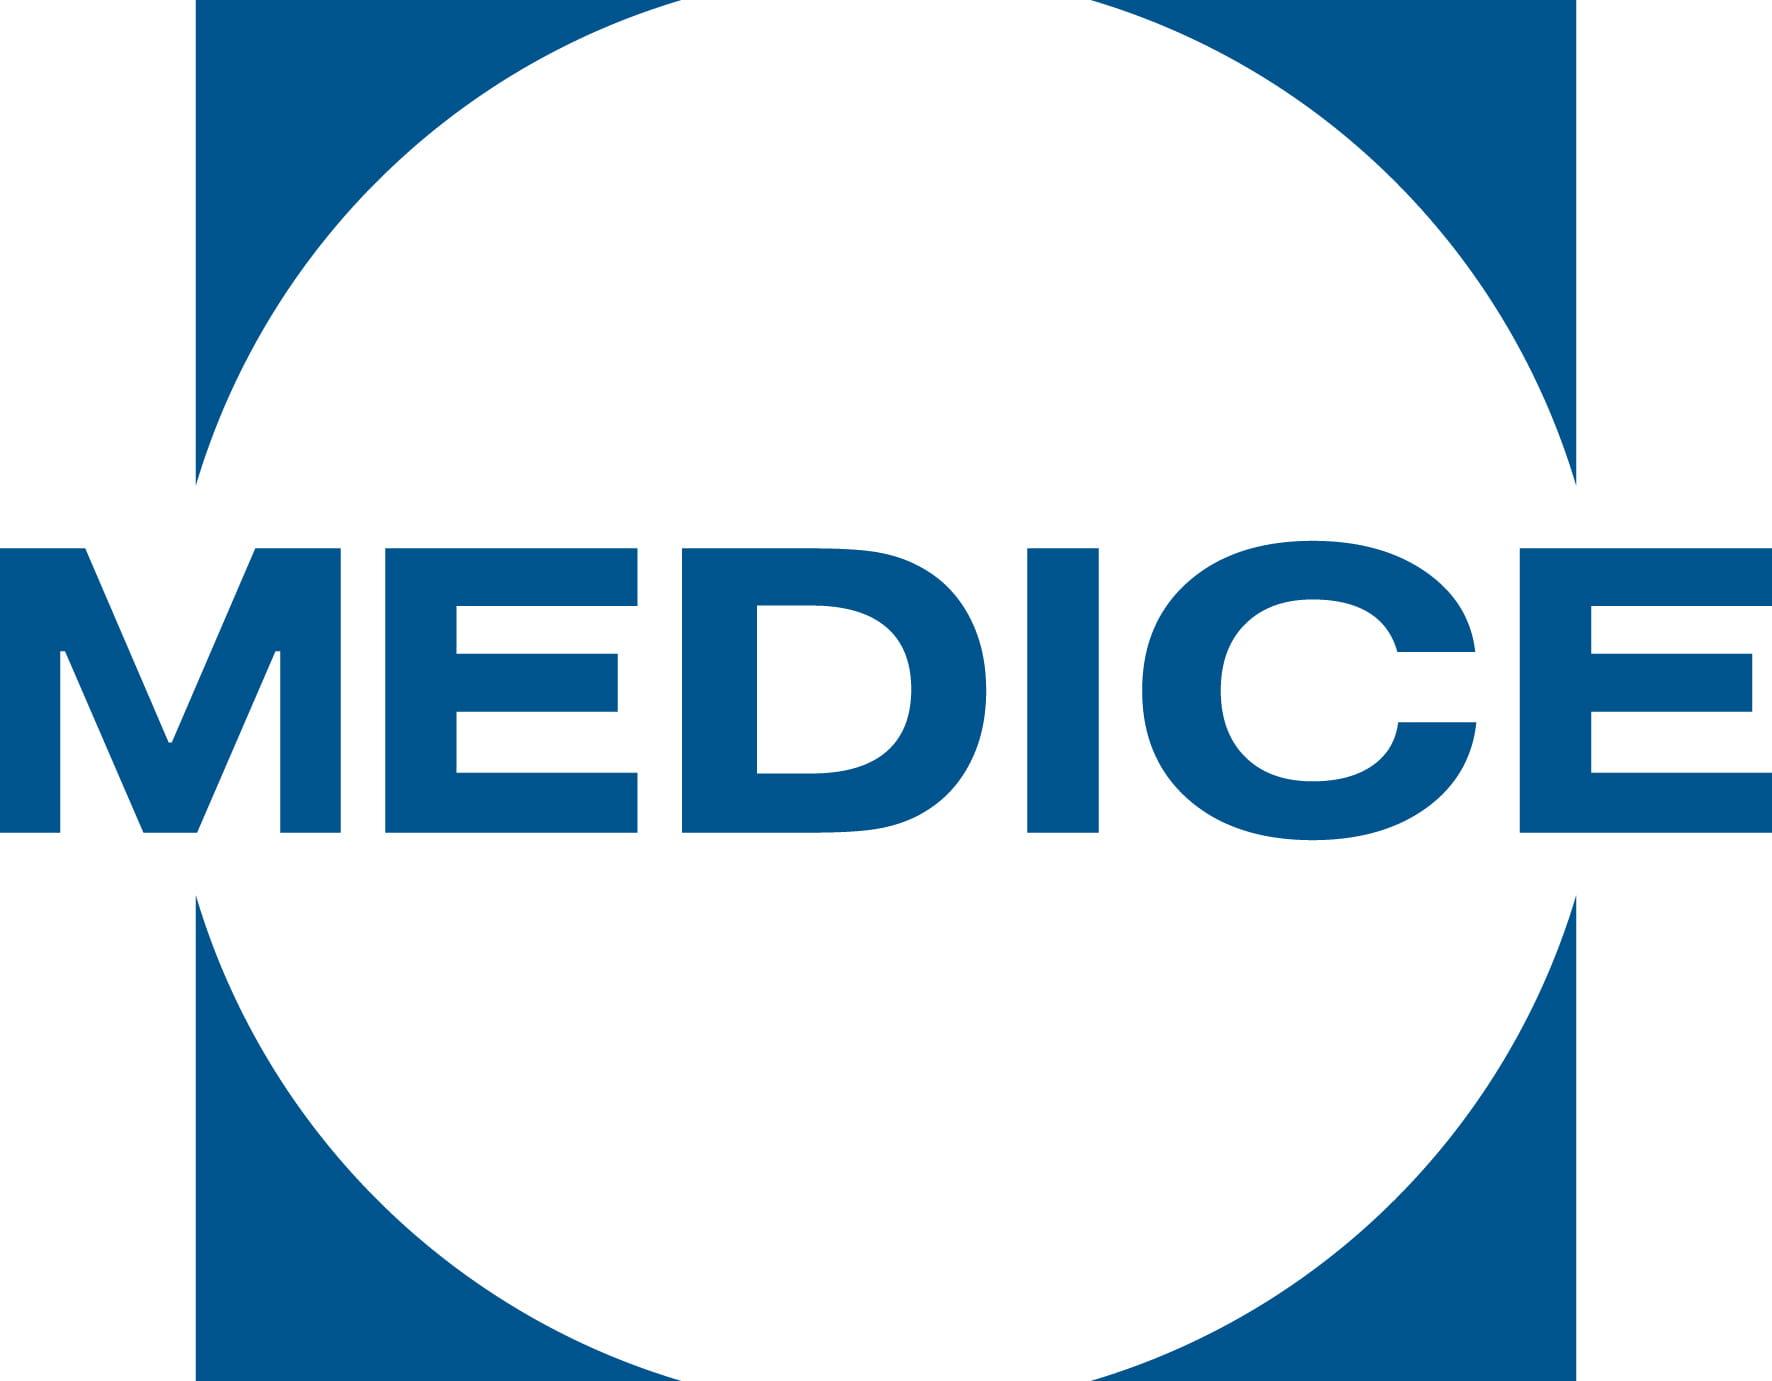 MEDICE Arzneimittel Pütter GmbH&Co.KG